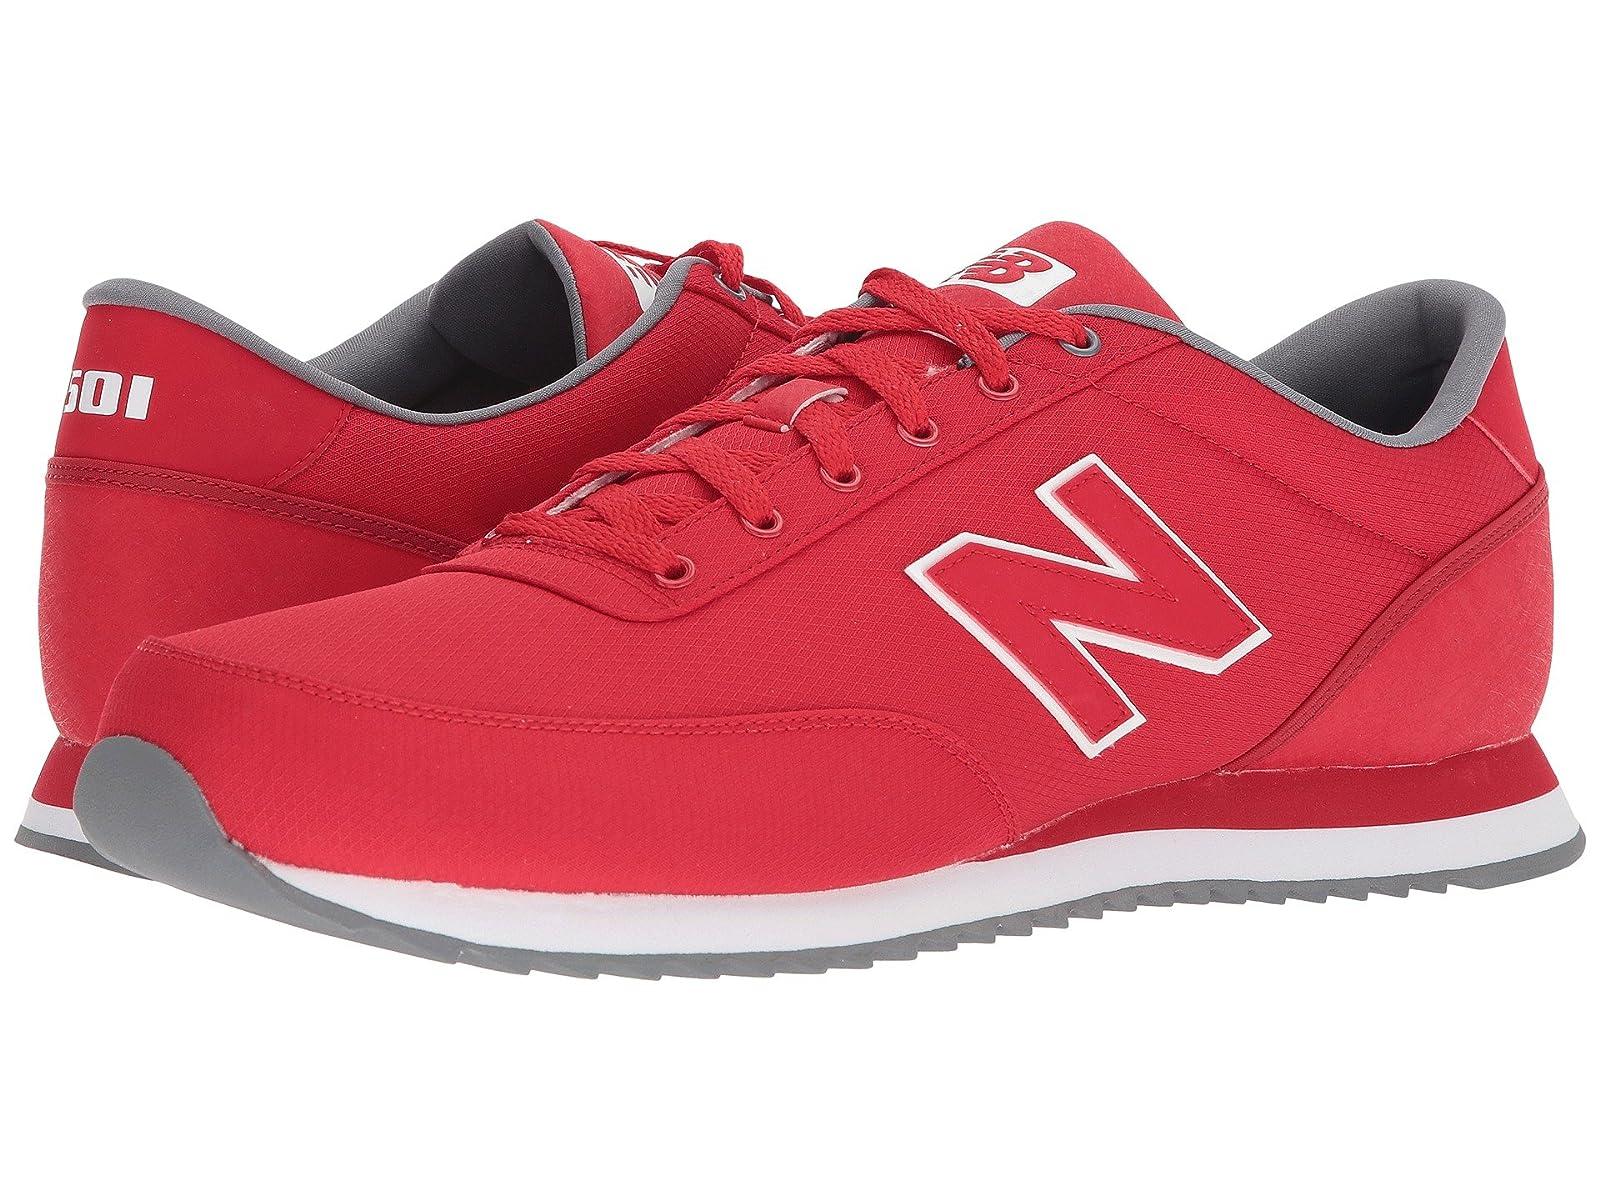 New Balance Classics MZ501v1Cheap and distinctive eye-catching shoes